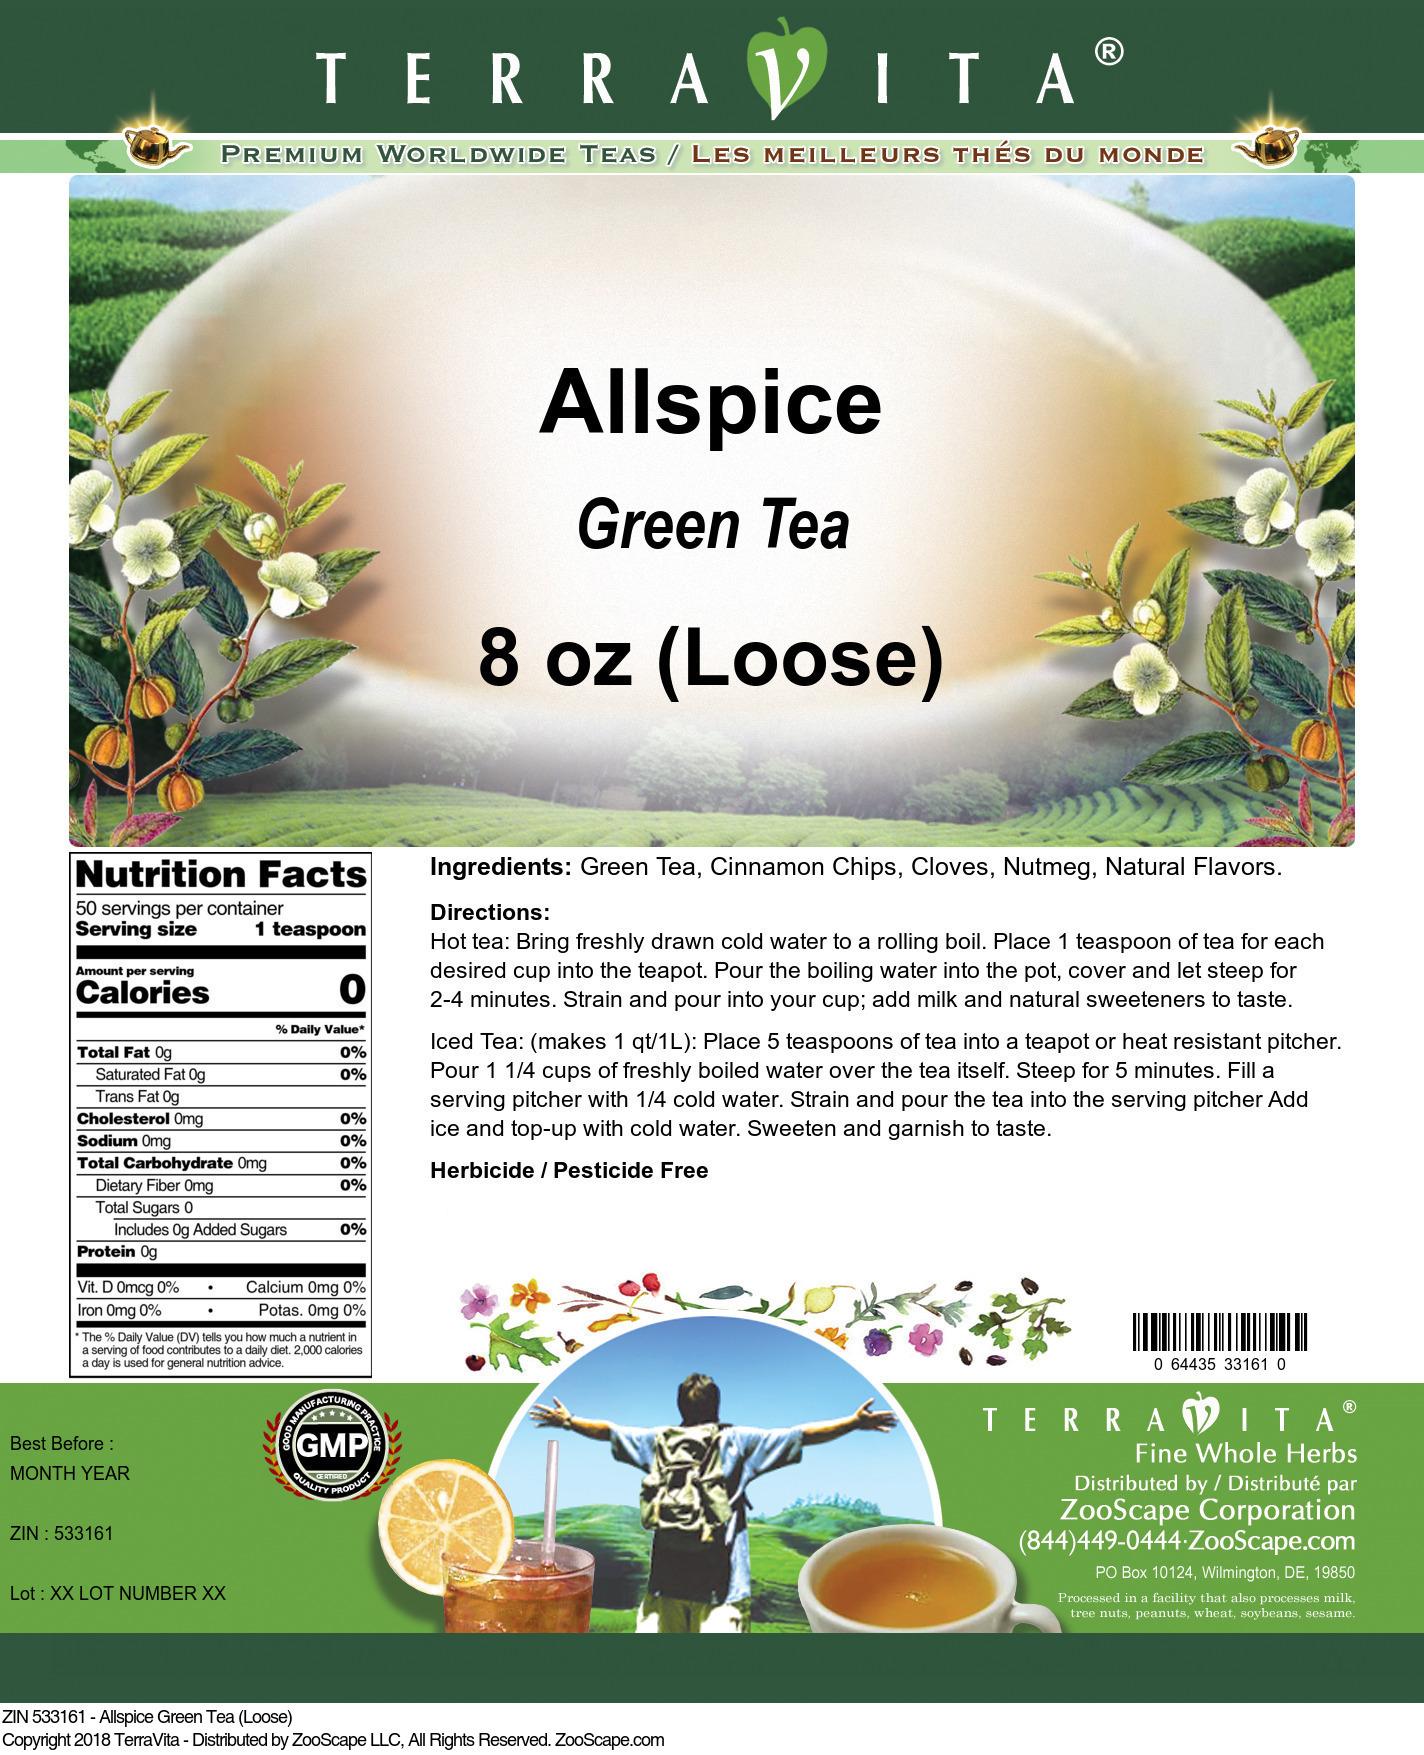 Allspice Green Tea (Loose)